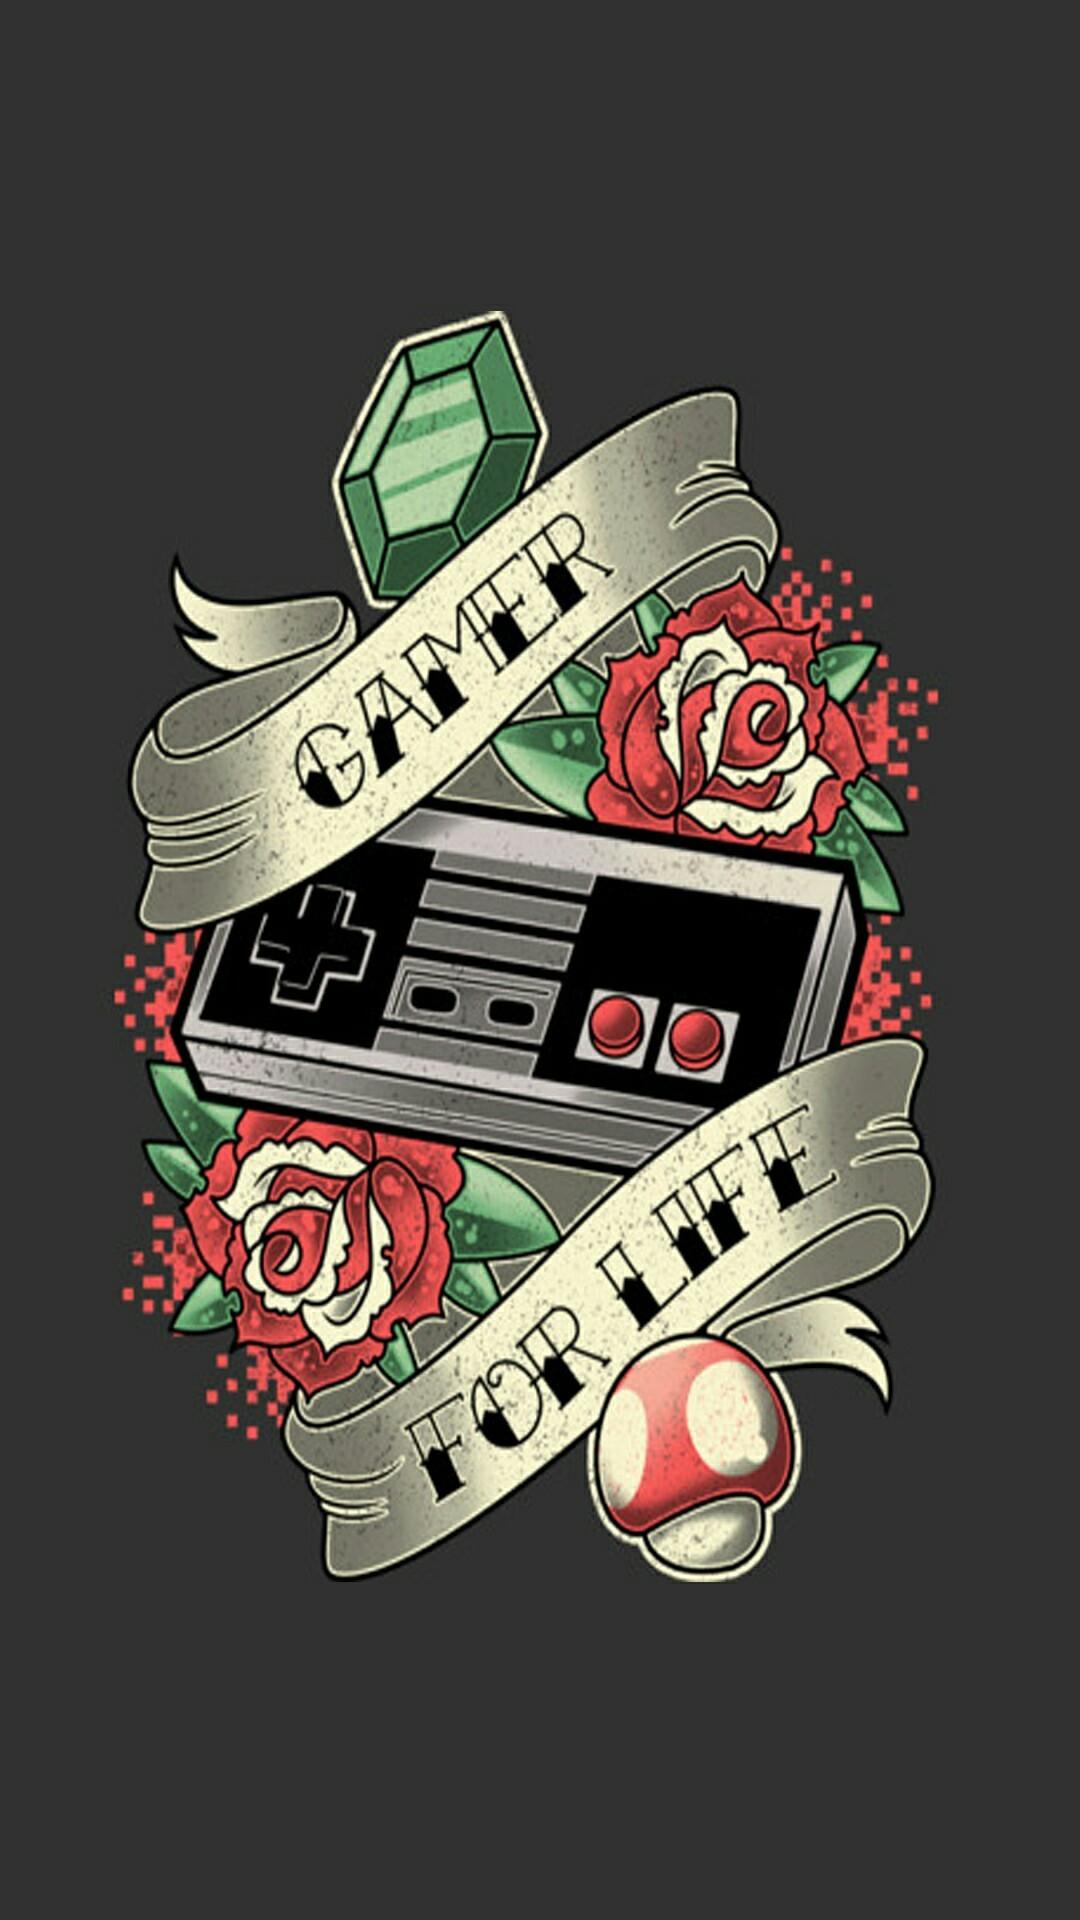 Res: 1080x1920, Gamer Wallpaper